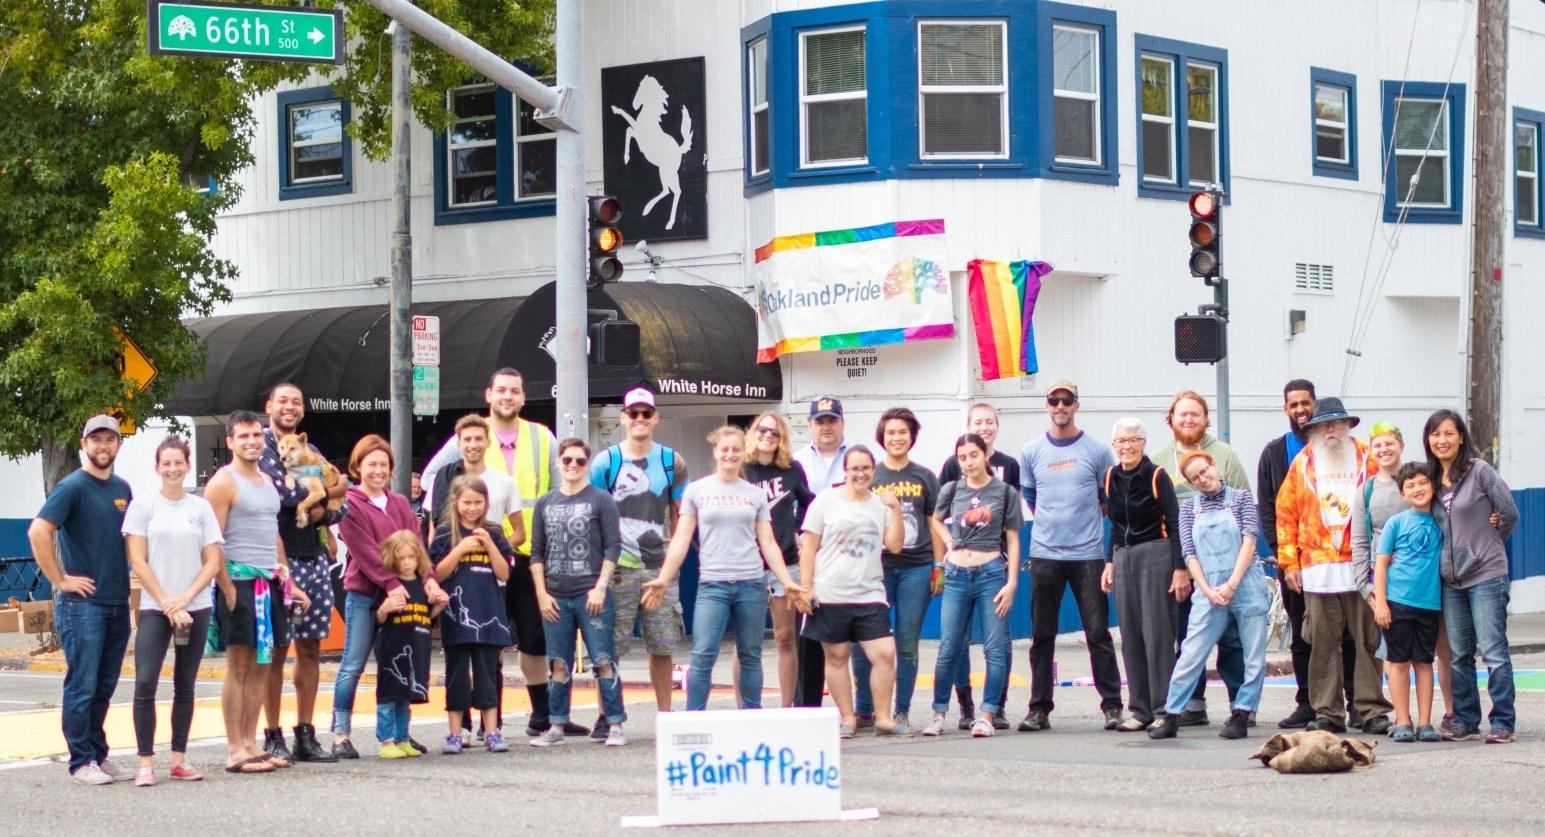 Oakland+Pride+2.jpg